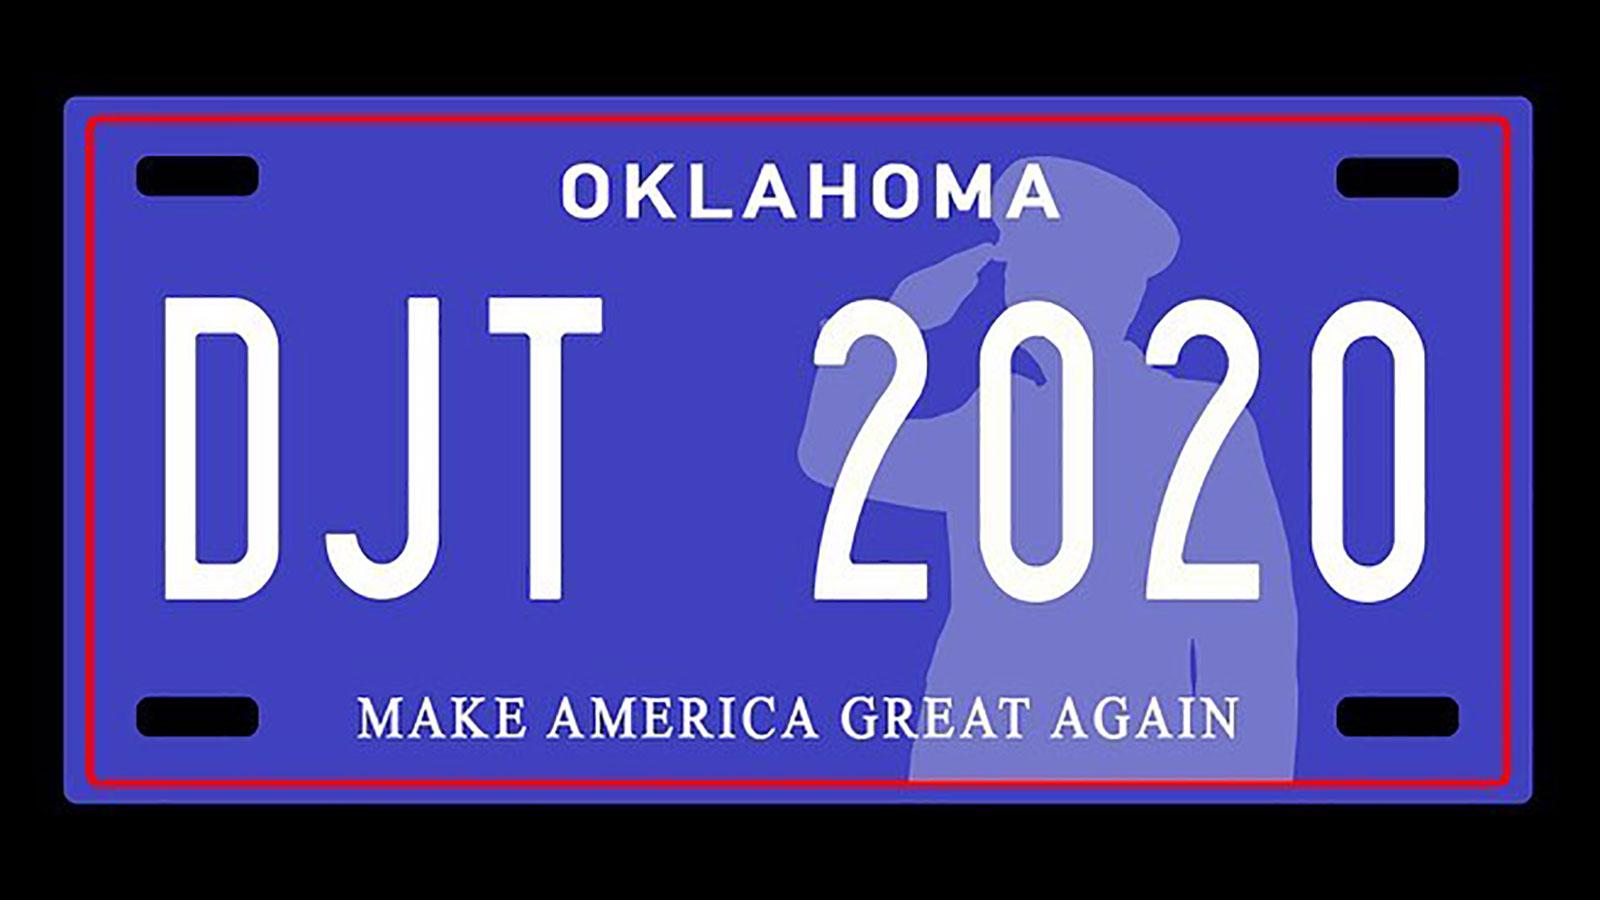 Oklahoma senators filed a bill to create 'Make America Great Again' license plates